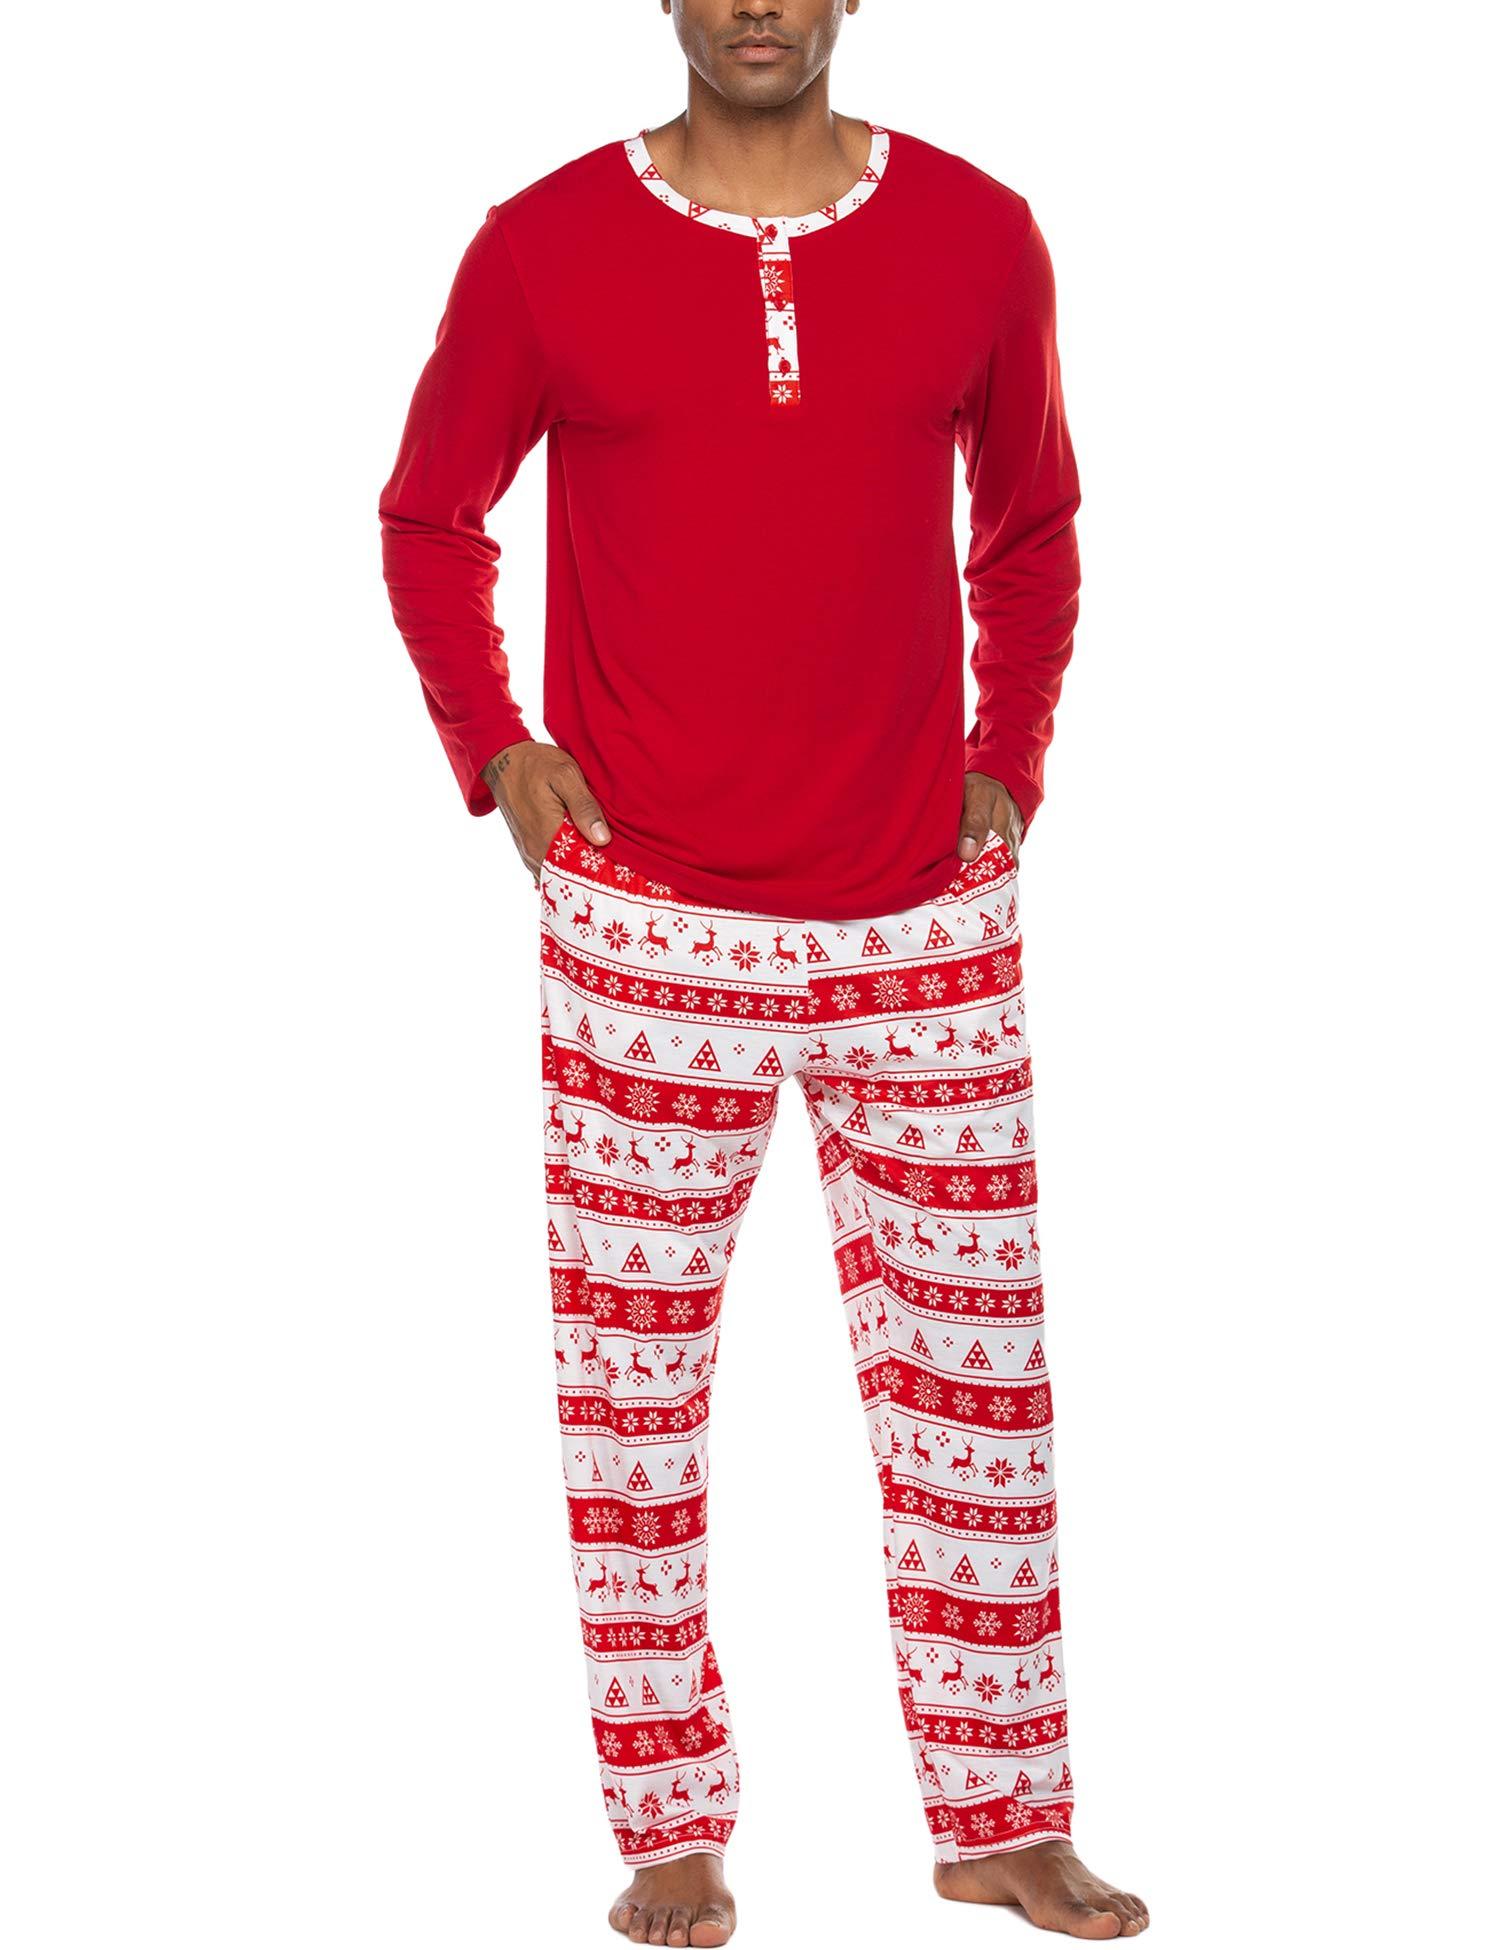 Ekouaer Men's Pajama Christmas Sleepwear Cotton Long Sleeve Lounge Holiday Printed 2 Piece pj Set